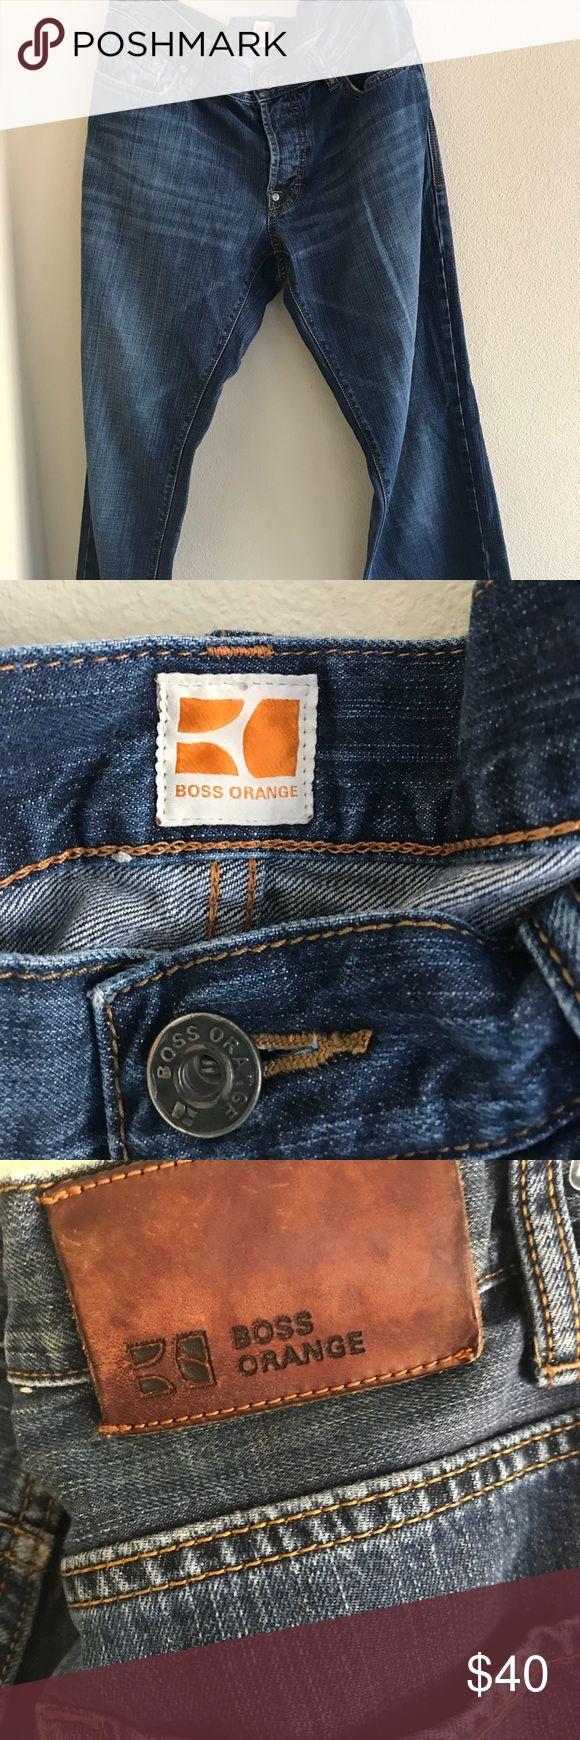 BOSS Orange Straight jeans 33x32 ❗️❗️BUY TWO GET ONE FREE SALE ❗️❗️ Boss Orange designer jeans Hugo Boss 33x32 Good condition   #kingcozi #aesthetic #fashion #style #streetwear #vintage #vintagestreetwear #90svintage #cozy #mensfashion #womensfashion #menswear #streetstyle #lifestyle #colors #sportswear #bodypositive #cybermonday #blackfriday BOSS ORANGE Jeans Straight